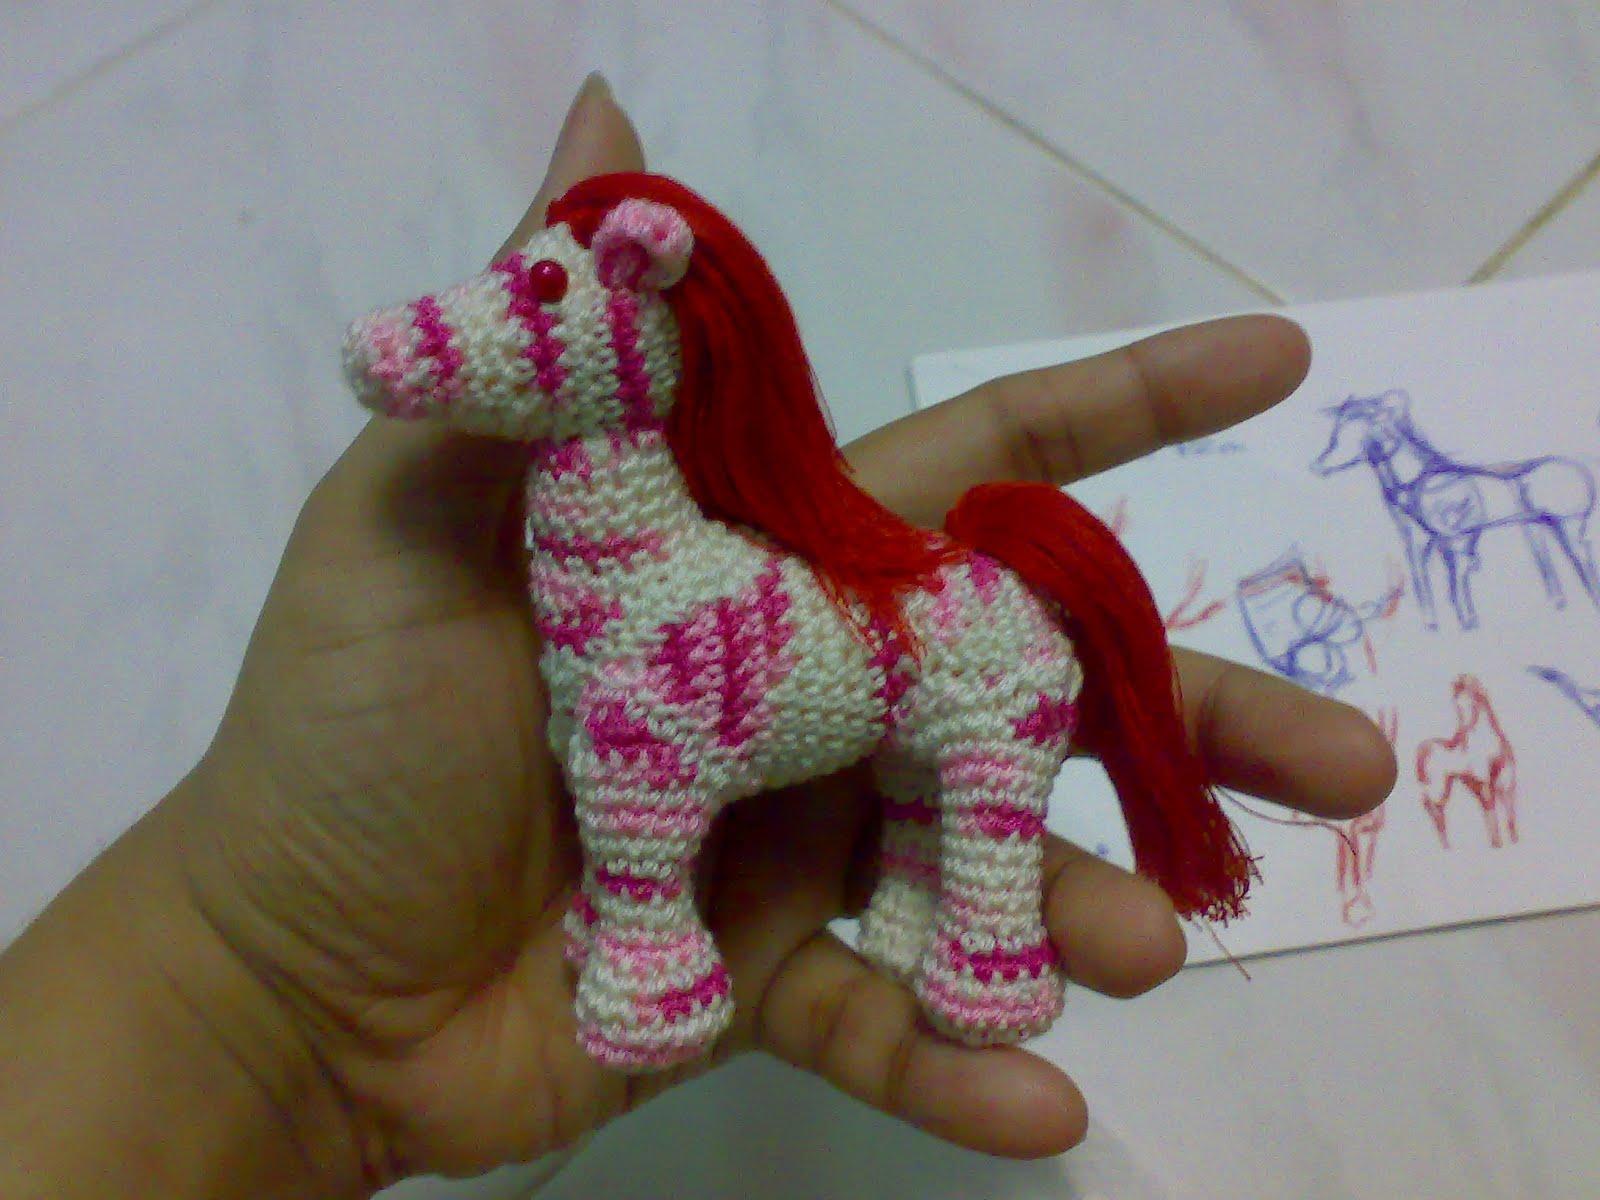 Amigurumi Crochet Horse Patterns - Amigurumi | 1200x1600